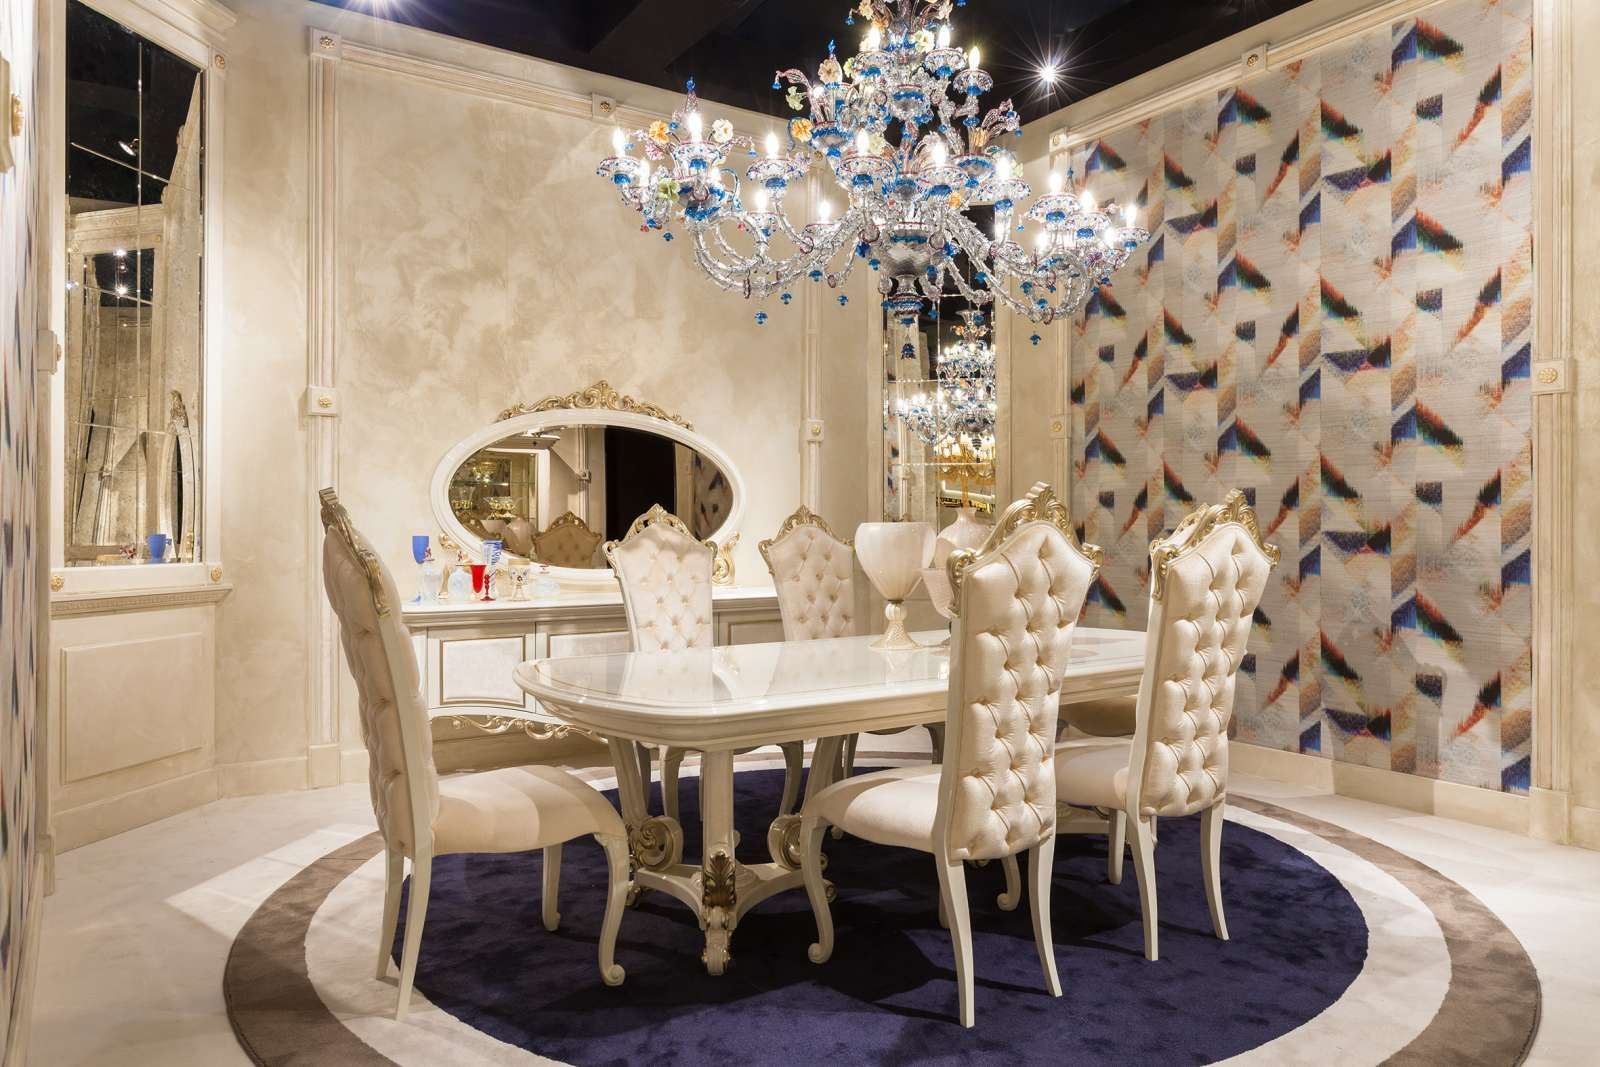 News turri the art of living mobili interni for Mobili italiani design